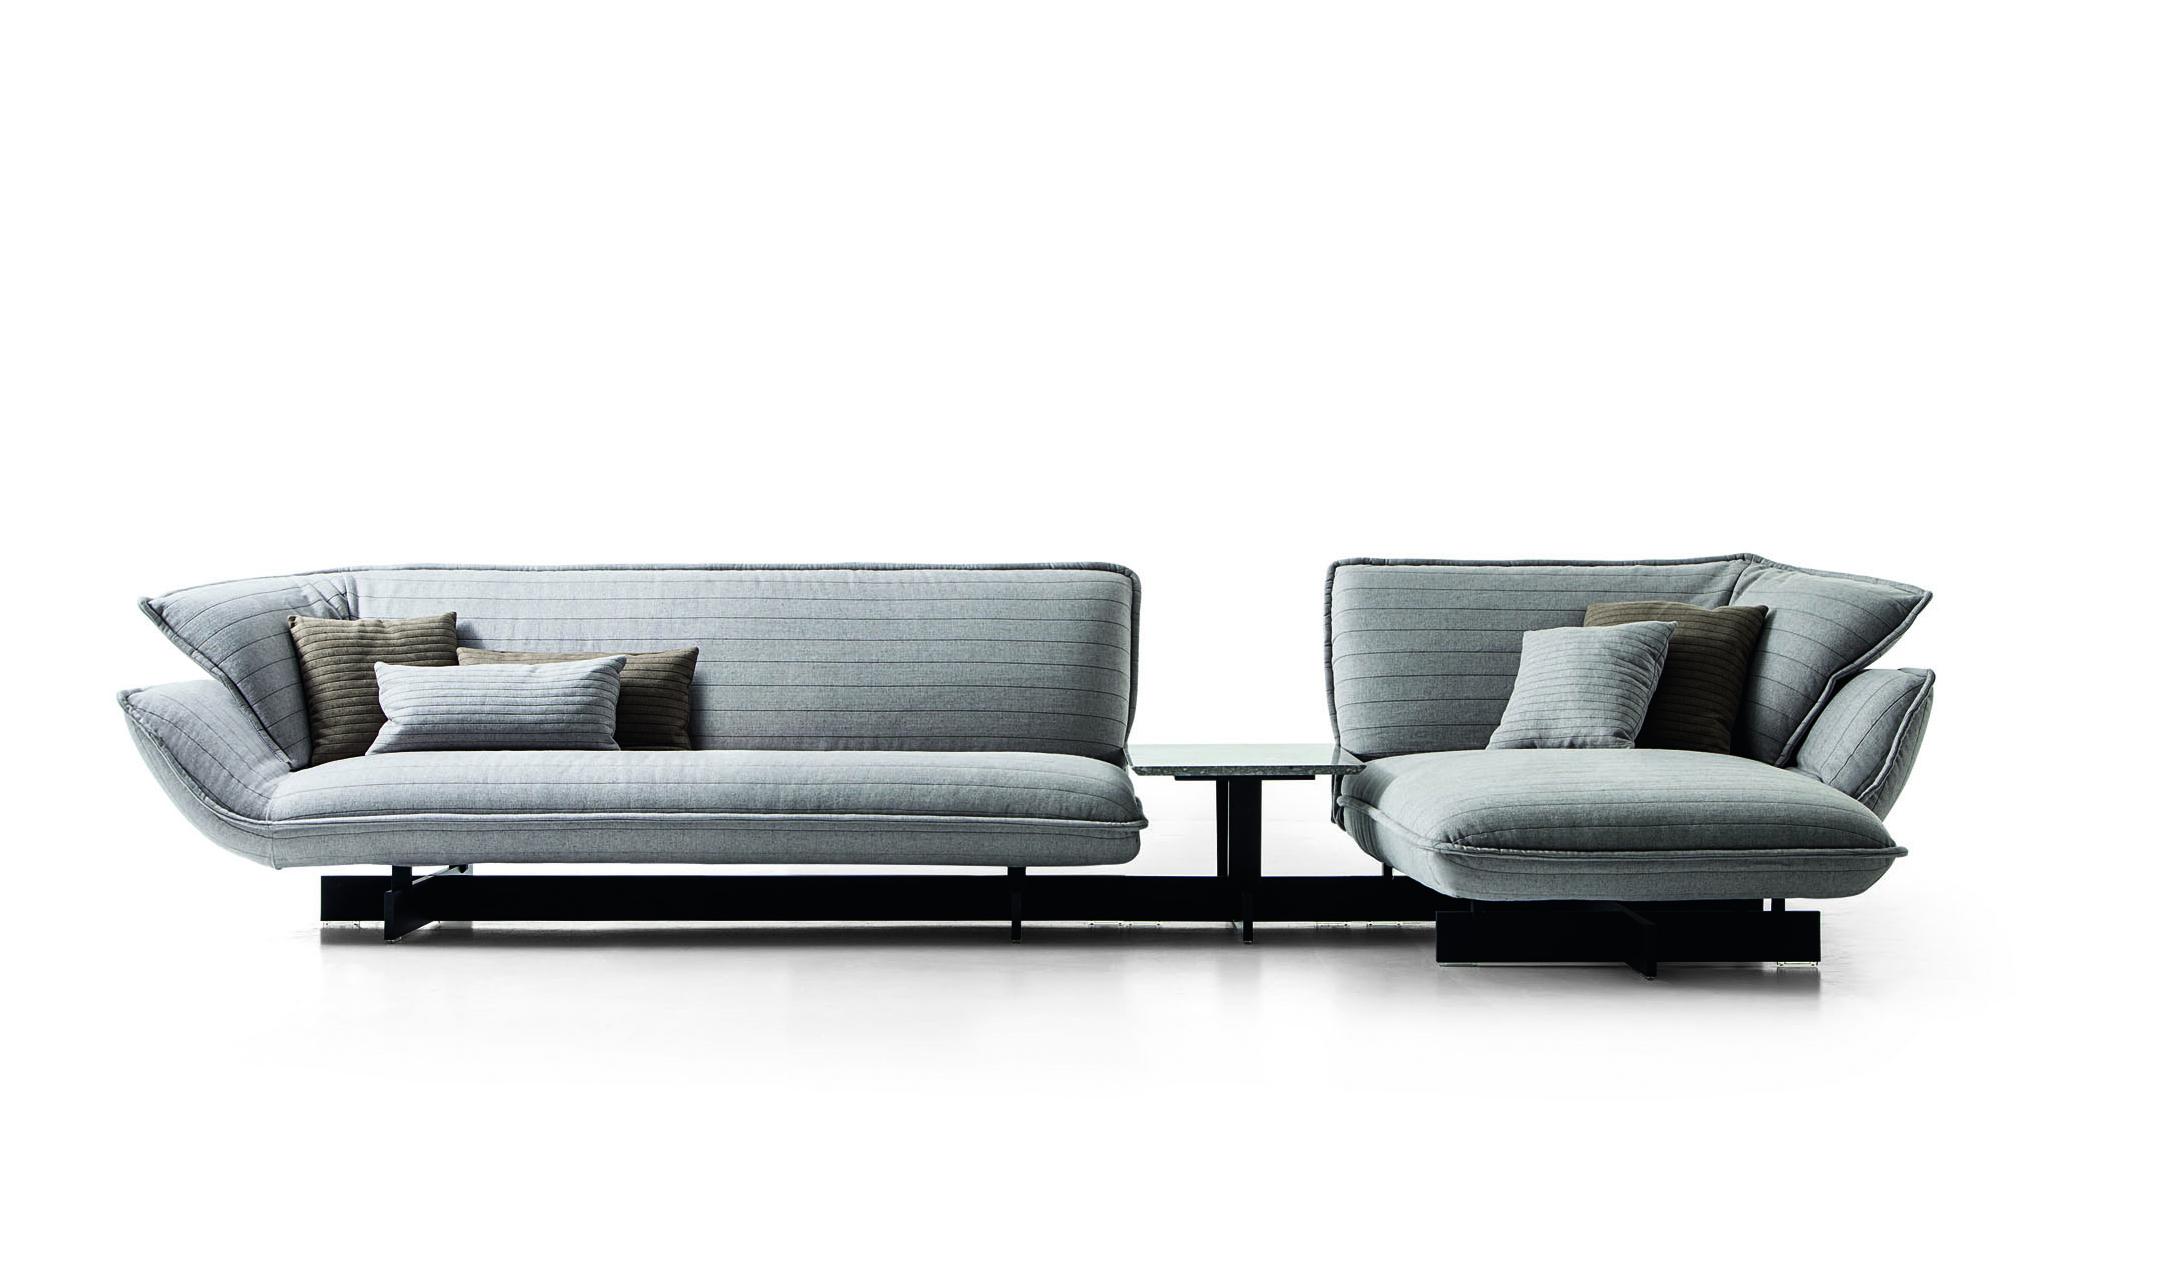 1_CASSINA_Beam-Sofa-System_Patricia-Urquiola